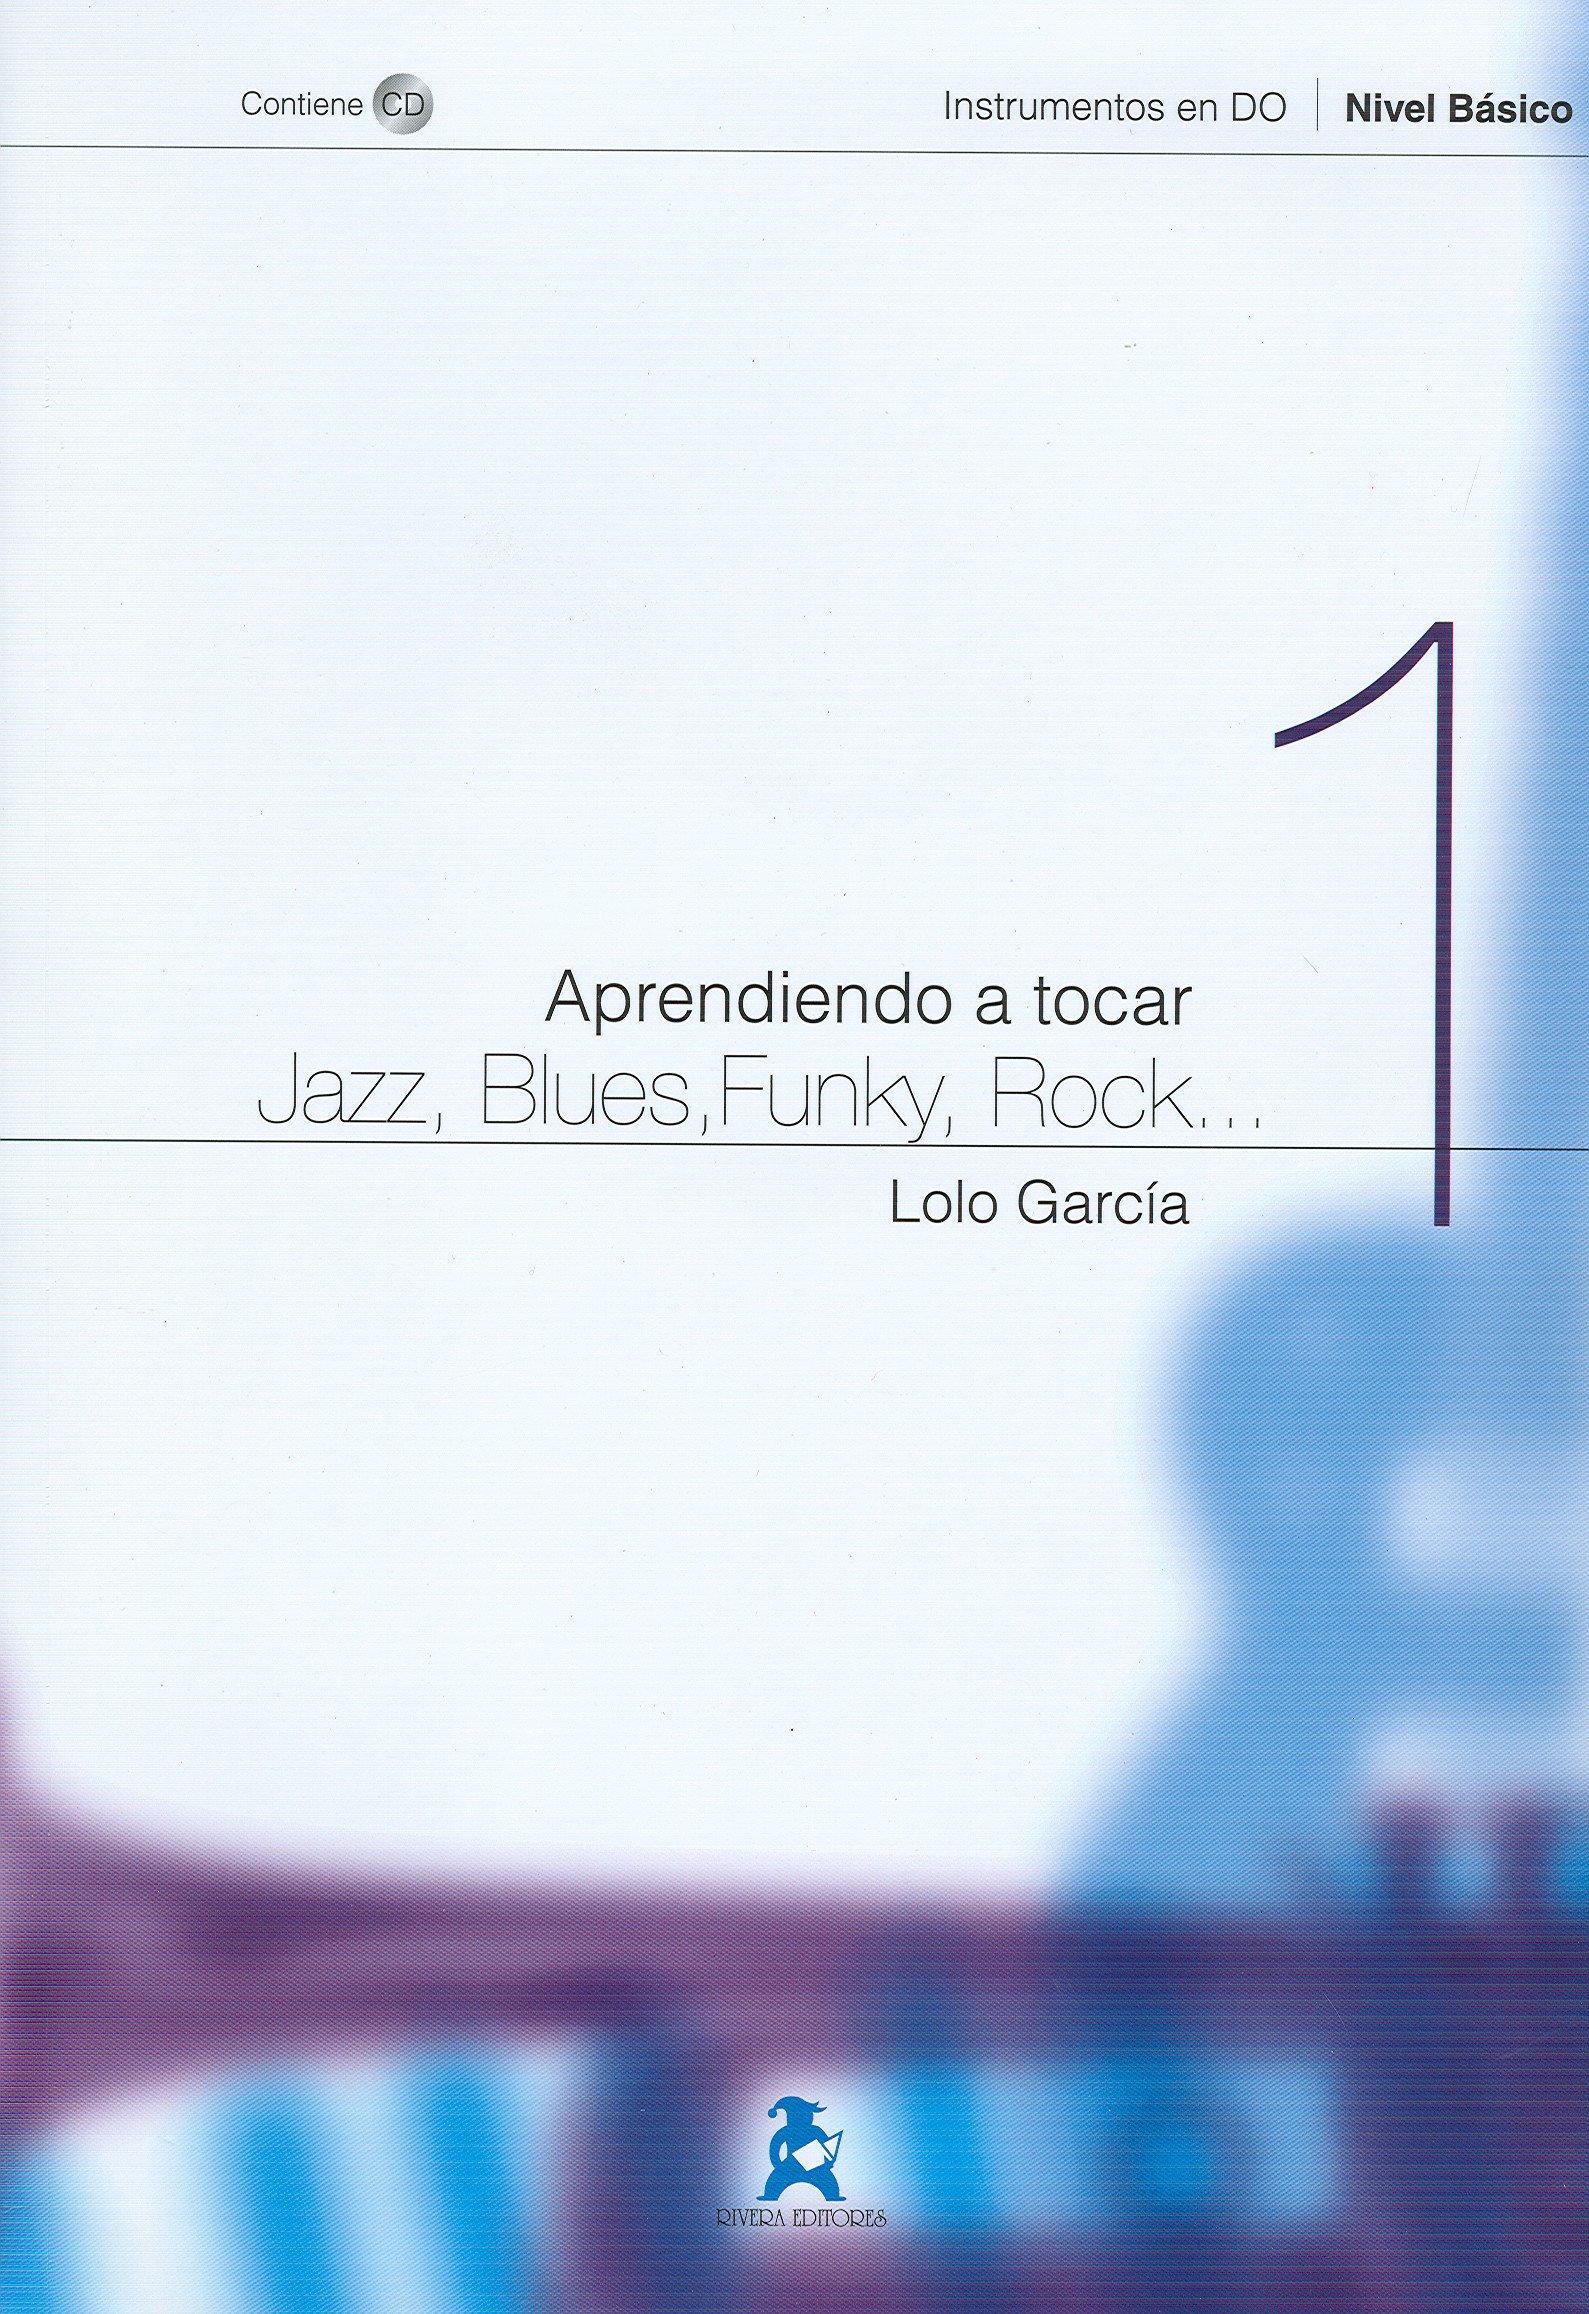 Download GARCIA Lolo - Aprendiendo a Tocar Jazz, Blues, Funky Vol.1 (Nivel Basico) (Inc.CD) pdf epub